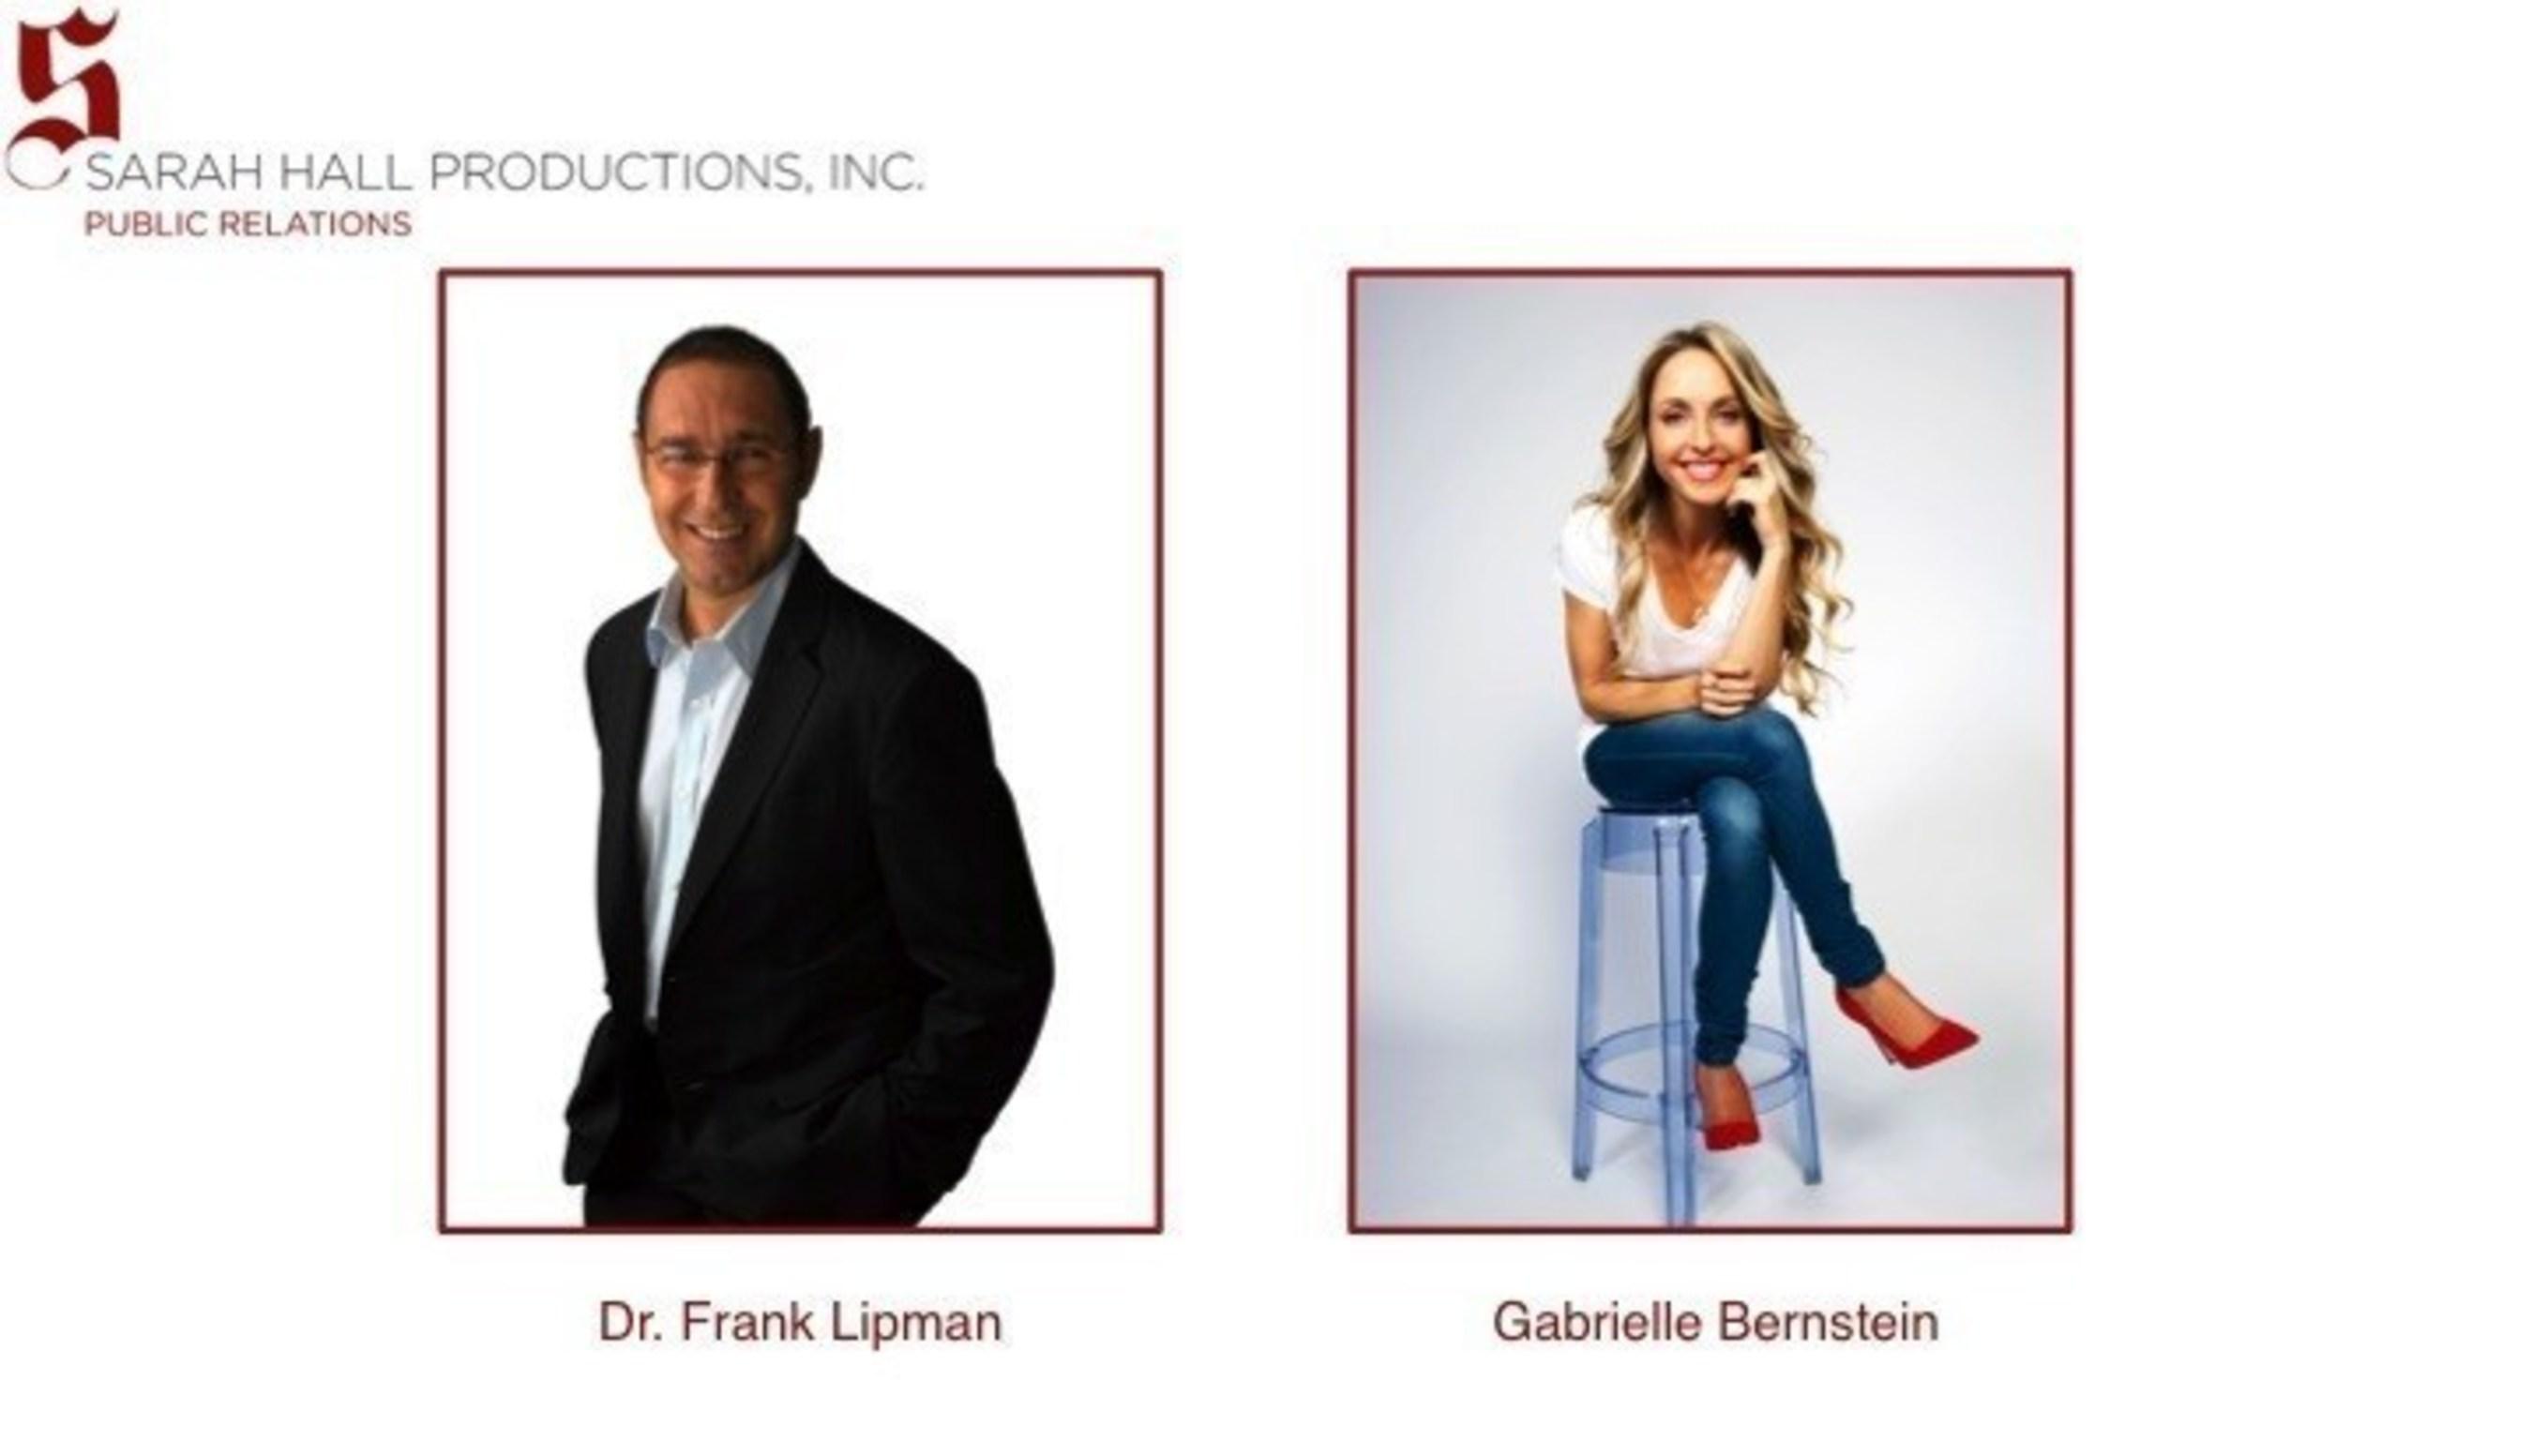 SHP's new clients: Dr. Frank Lipman (L) & Gabrielle Bernstein (R)